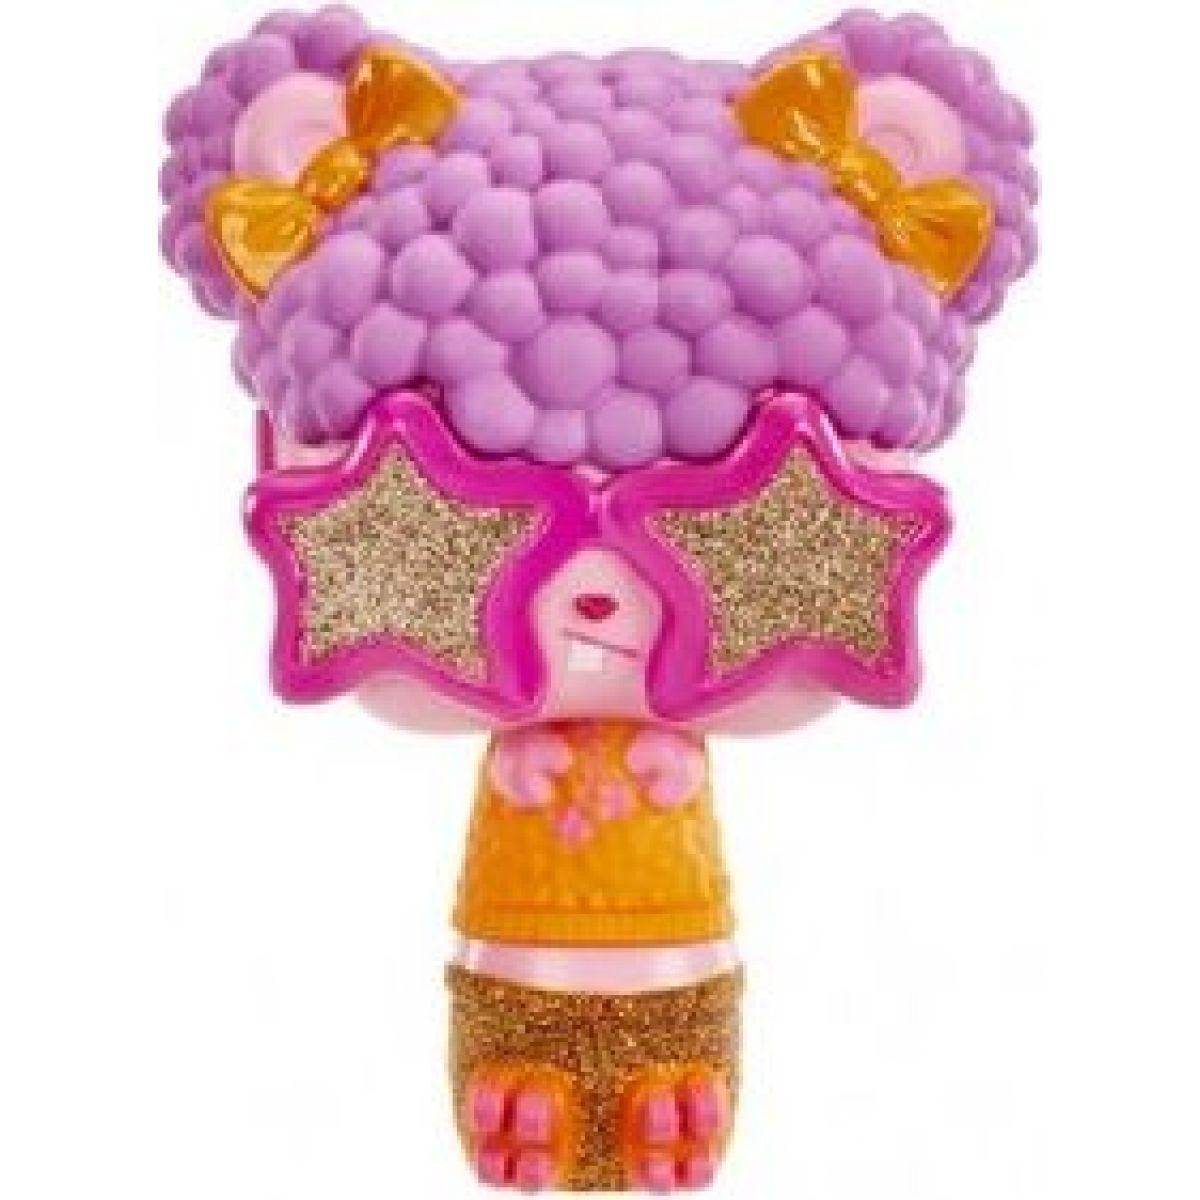 Pop Pop Hair Surprise 3-in-1 Pops 1. series růžové brýle, fialové vlasy